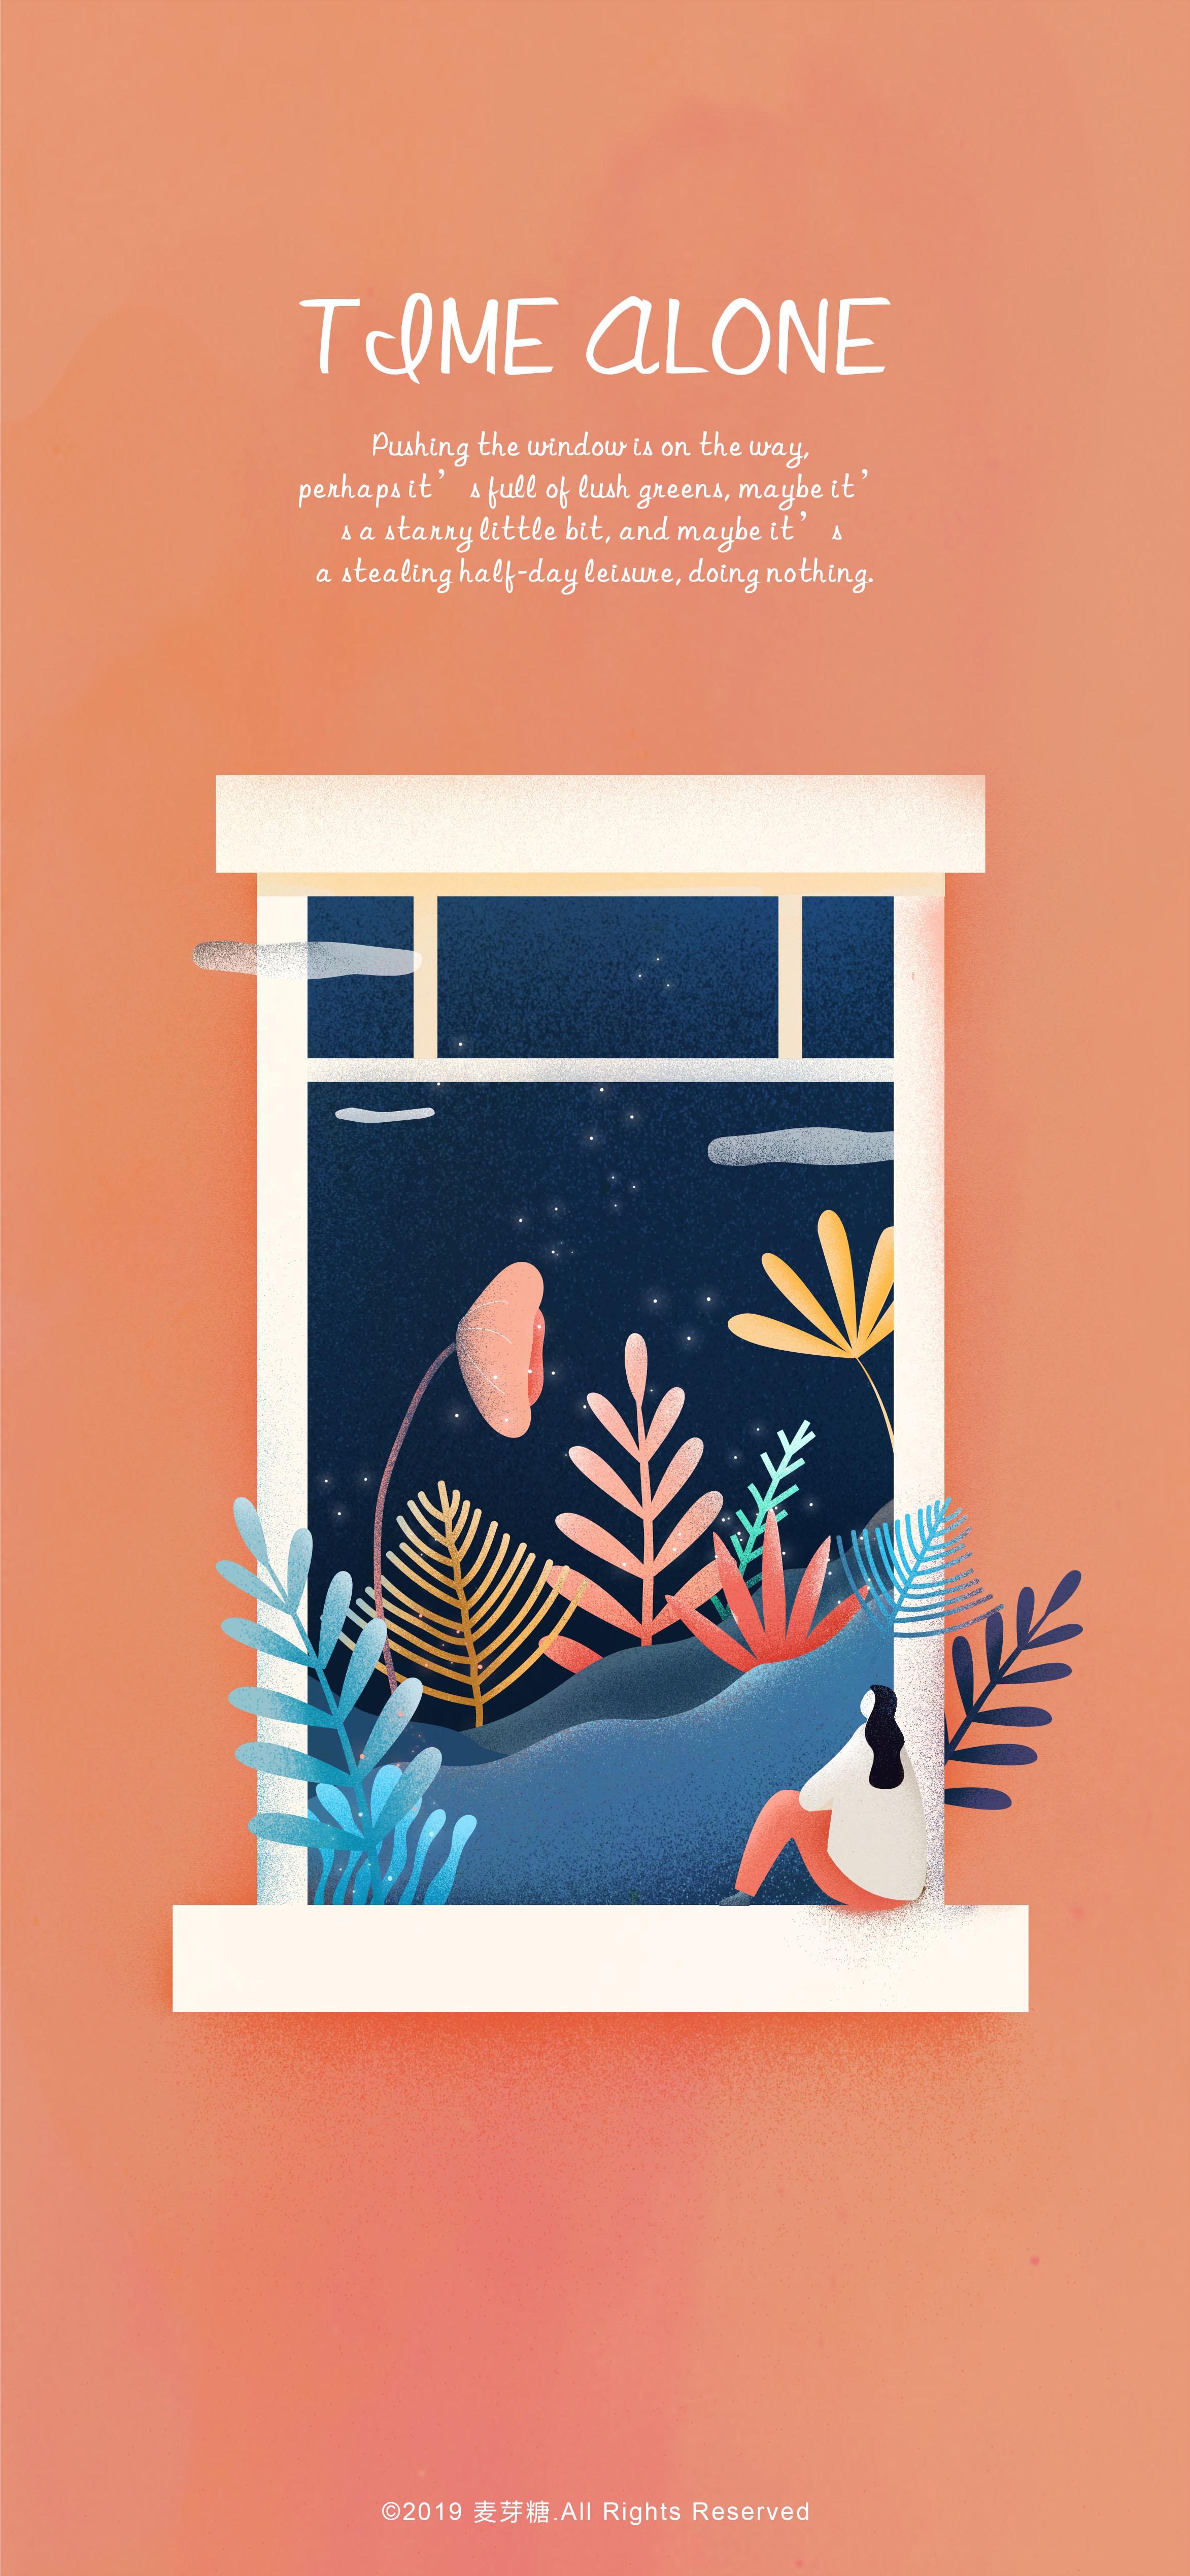 Window time